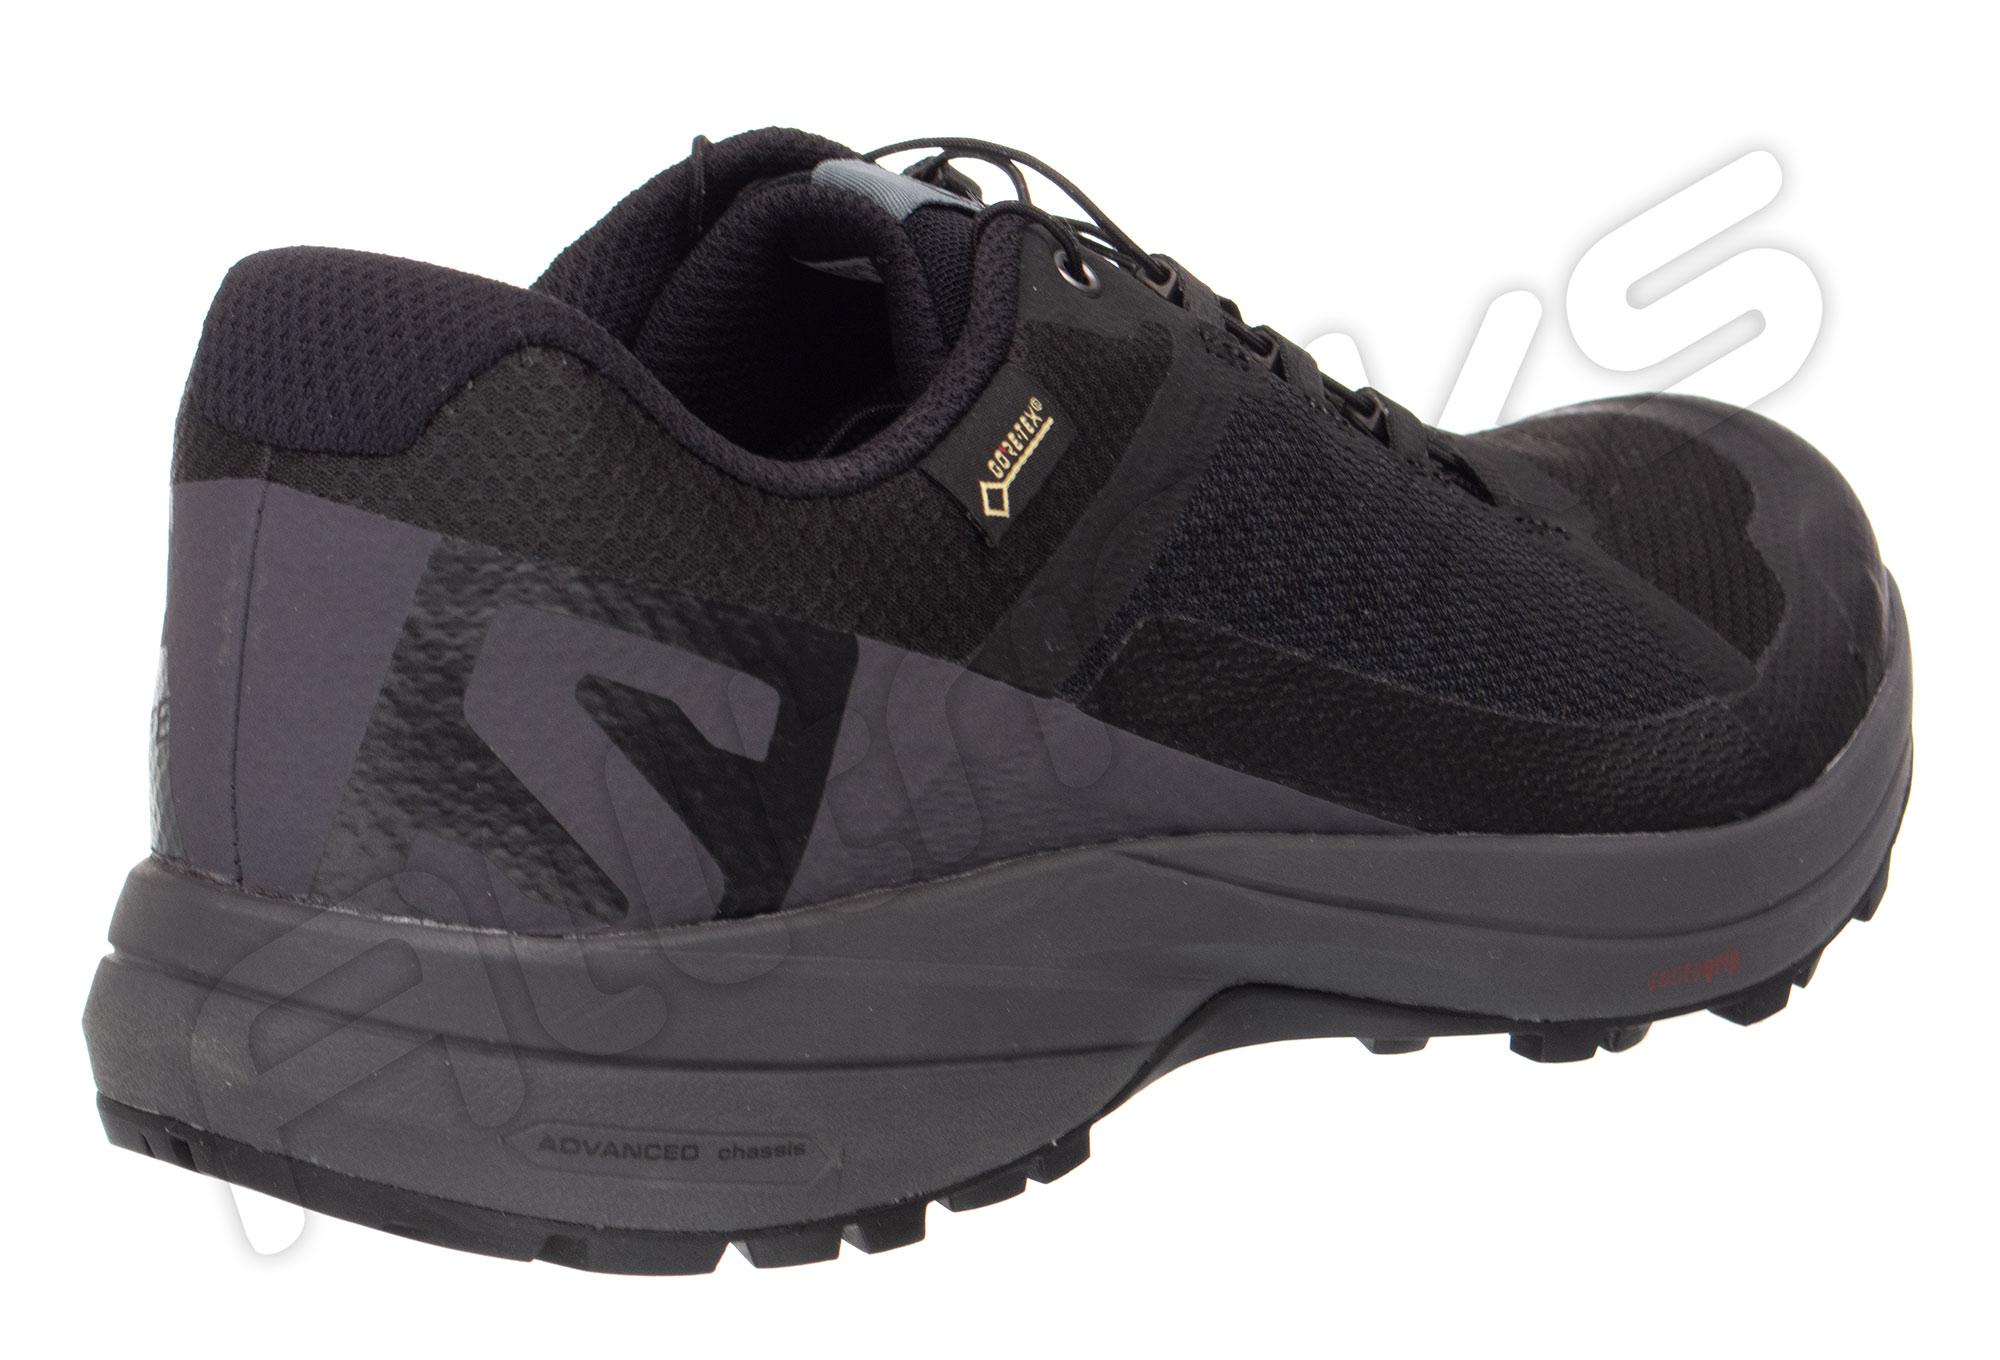 Salomon XA Elevate GTX Shoes Black